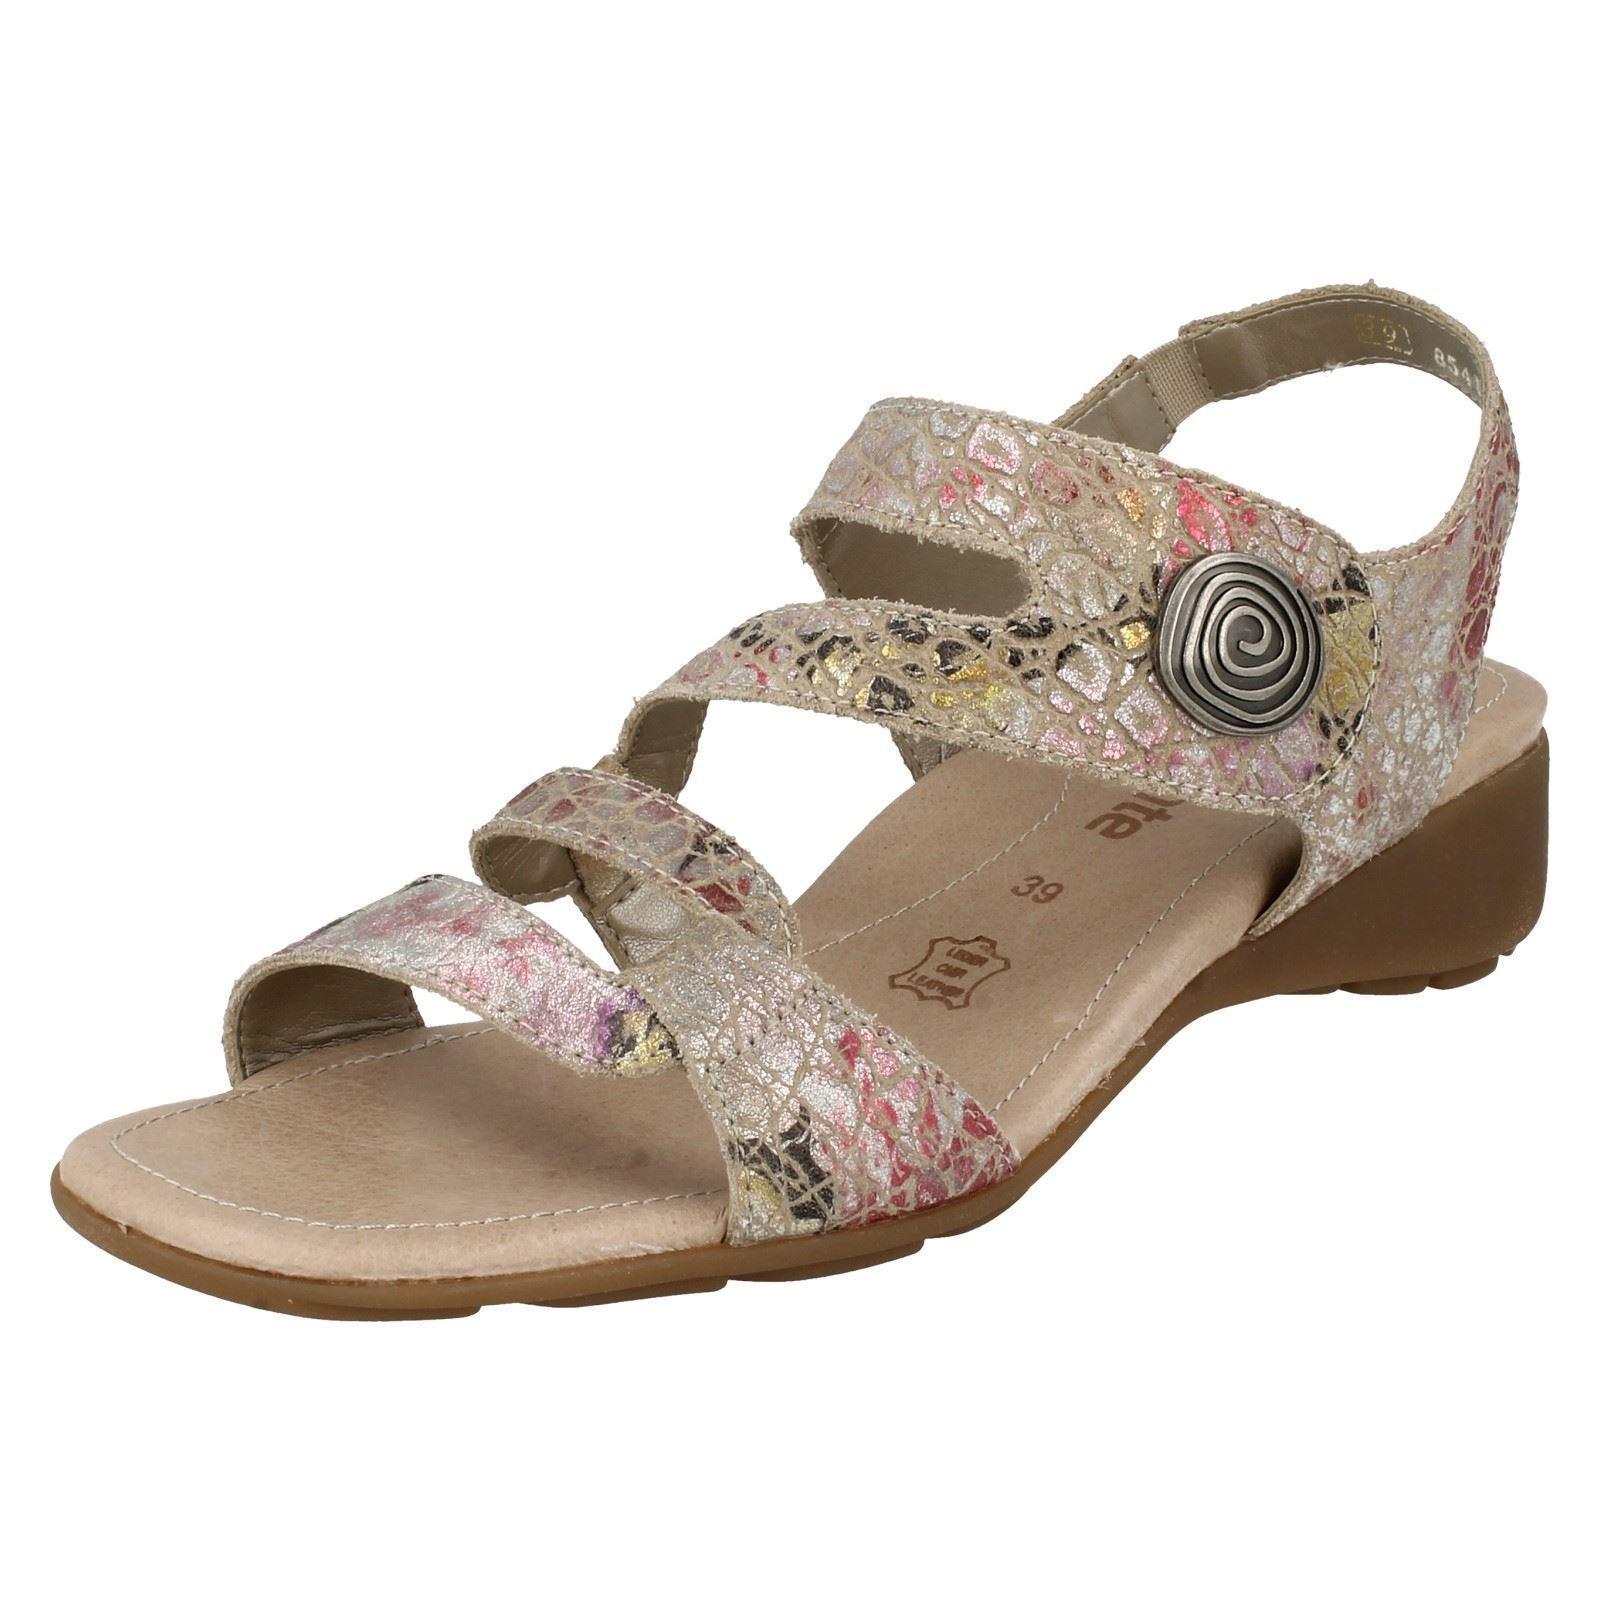 Último gran descuento Ladies Beige Combi Leather Riptape Remonte Summer Open Toe Sandals R5247